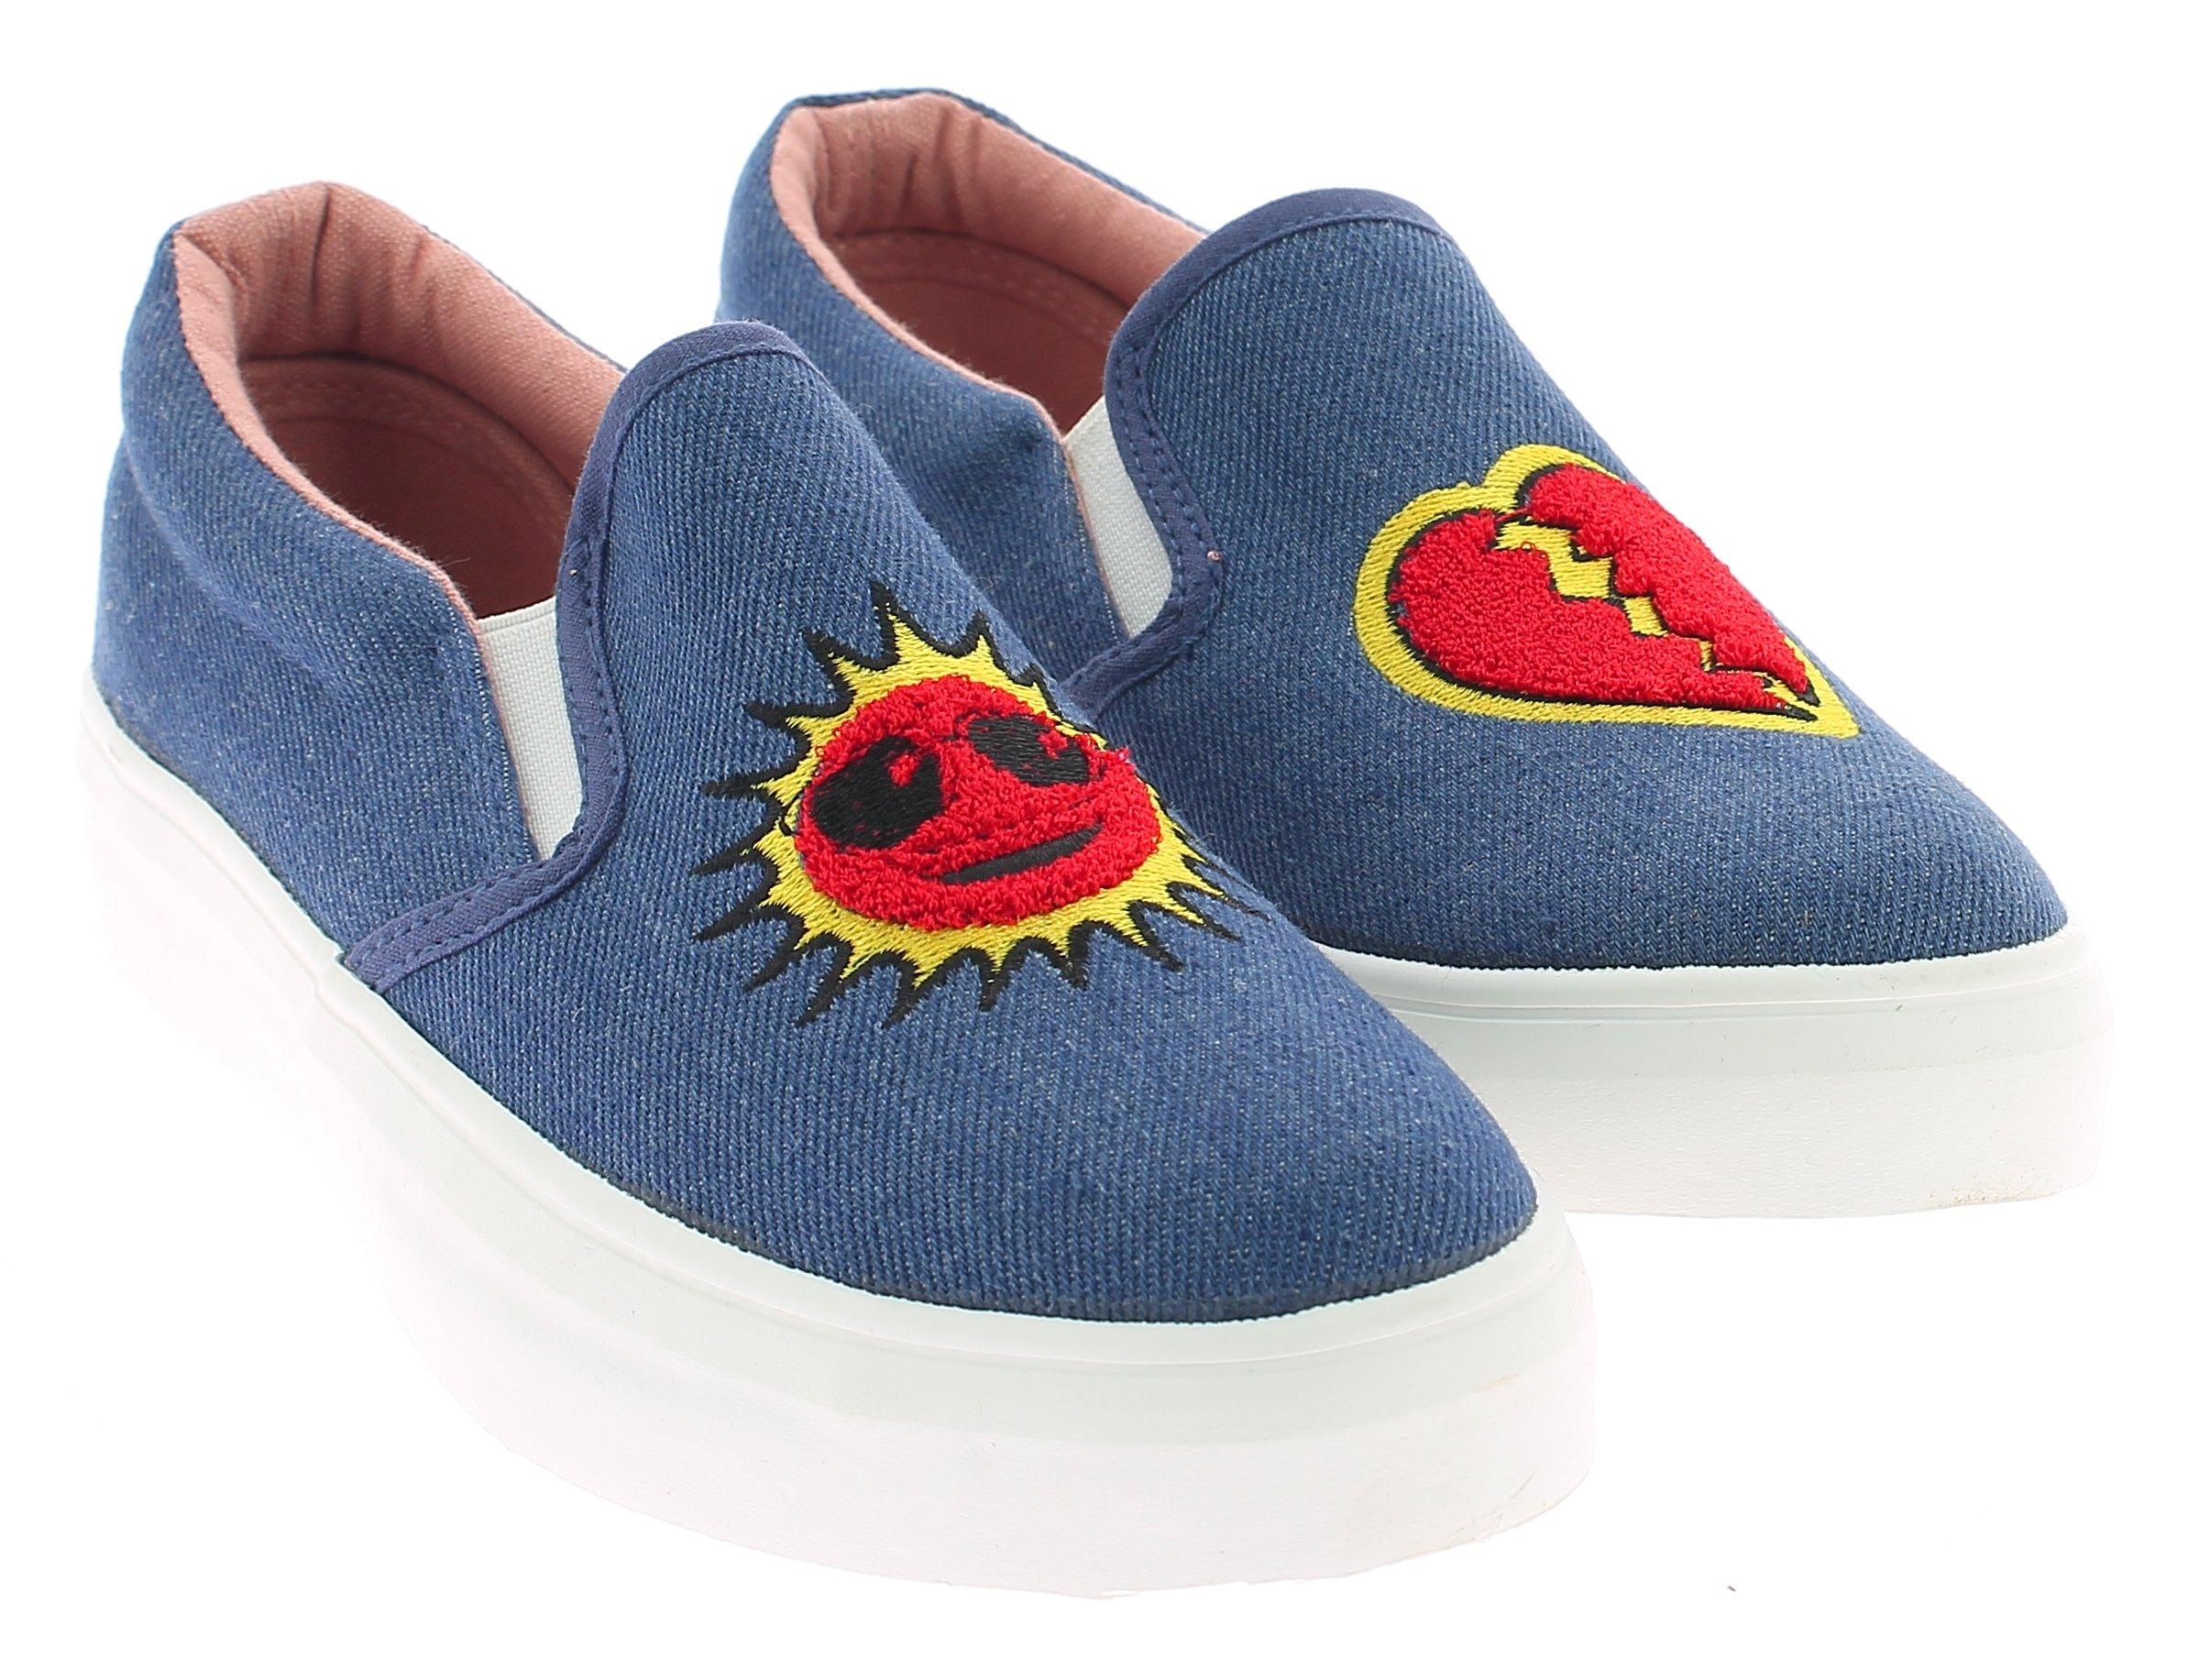 KYLIE Γυναικείο Casual K1720601 Τζίν - IqShoes - Κ1720601 JEAN-blue-41/1/23/28 προϊόντα παπούτσια